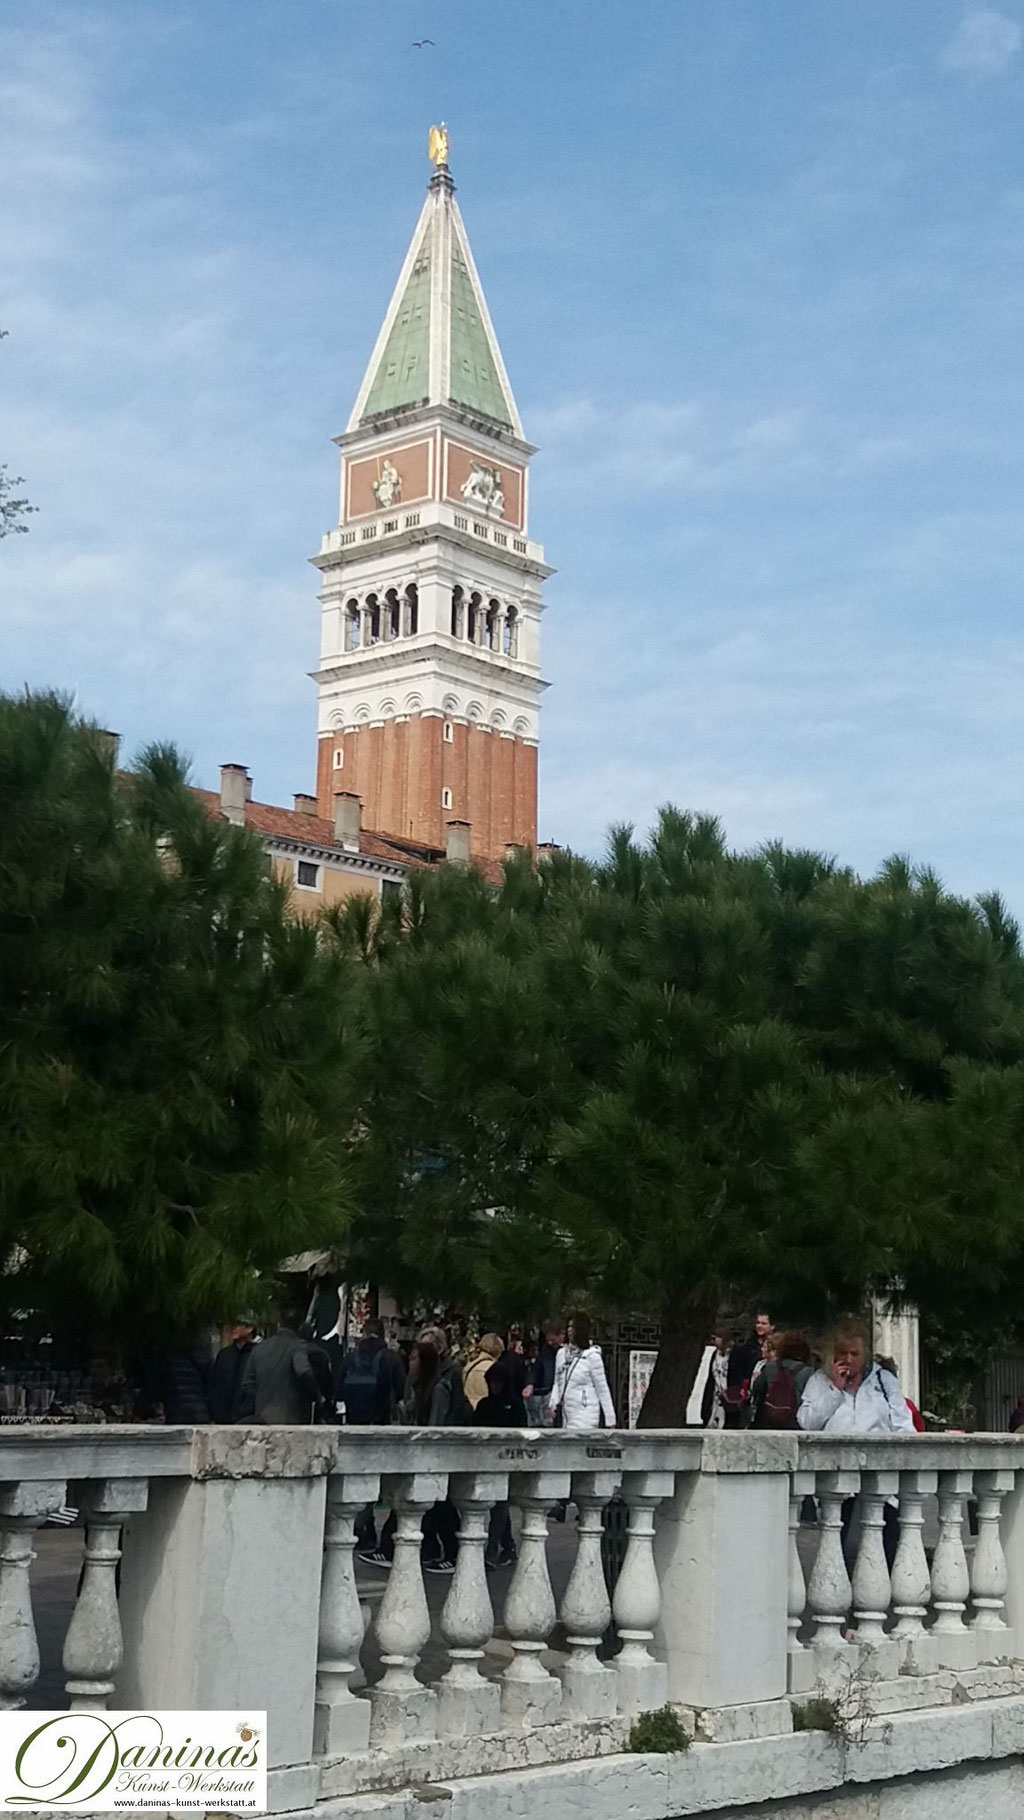 Venedig Campanile - Glocketum vom Markusdom